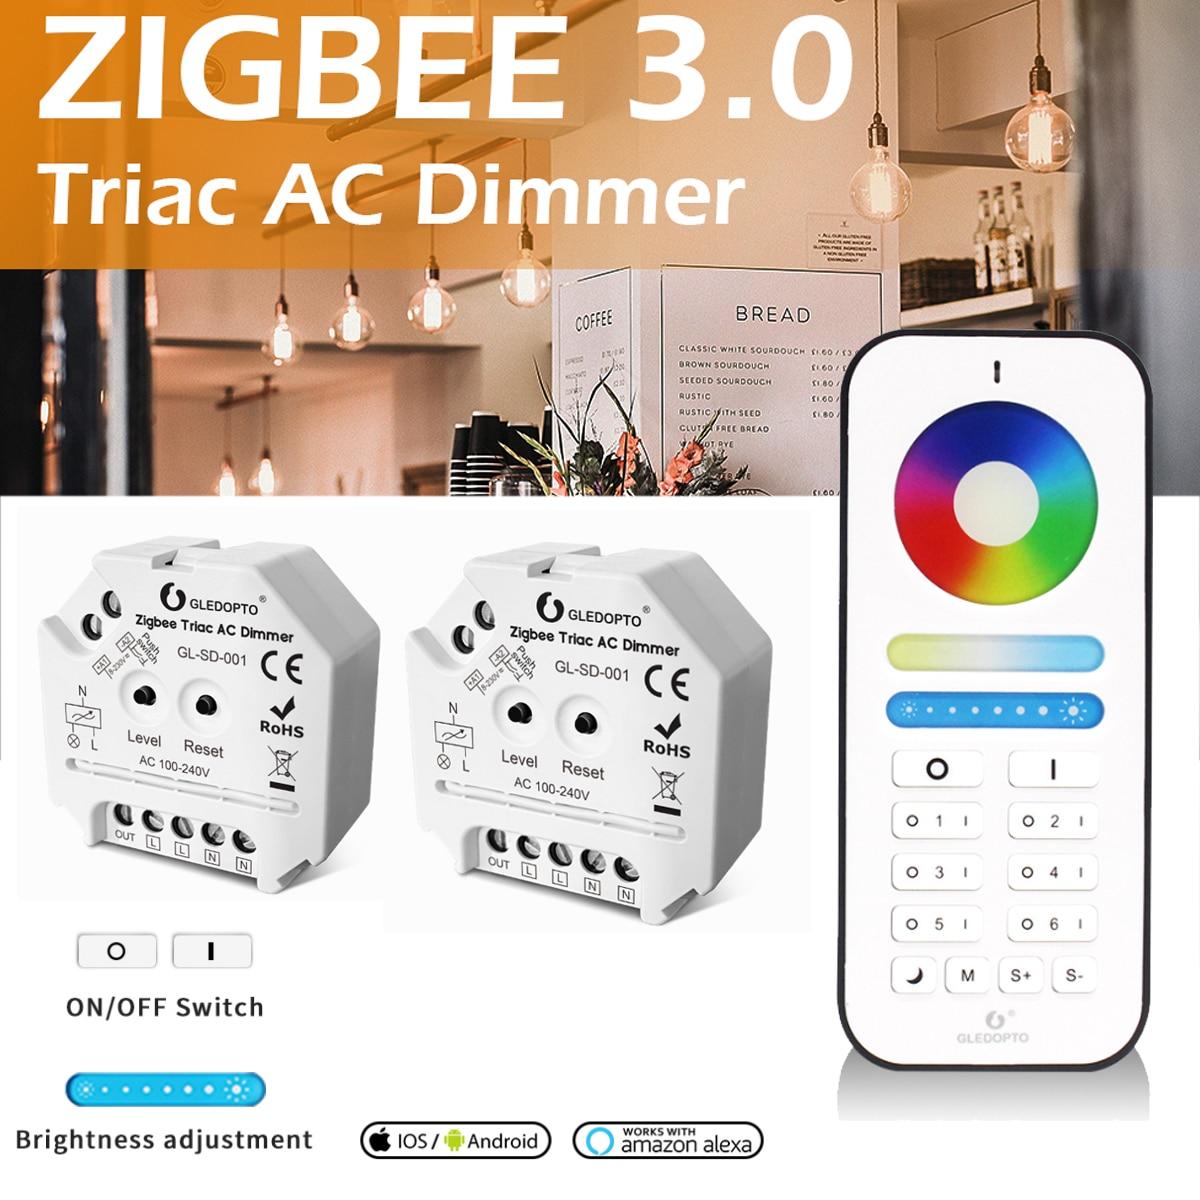 gledopto zigbee triac dimmer push switch 24g controle remoto casa inteligente lampada